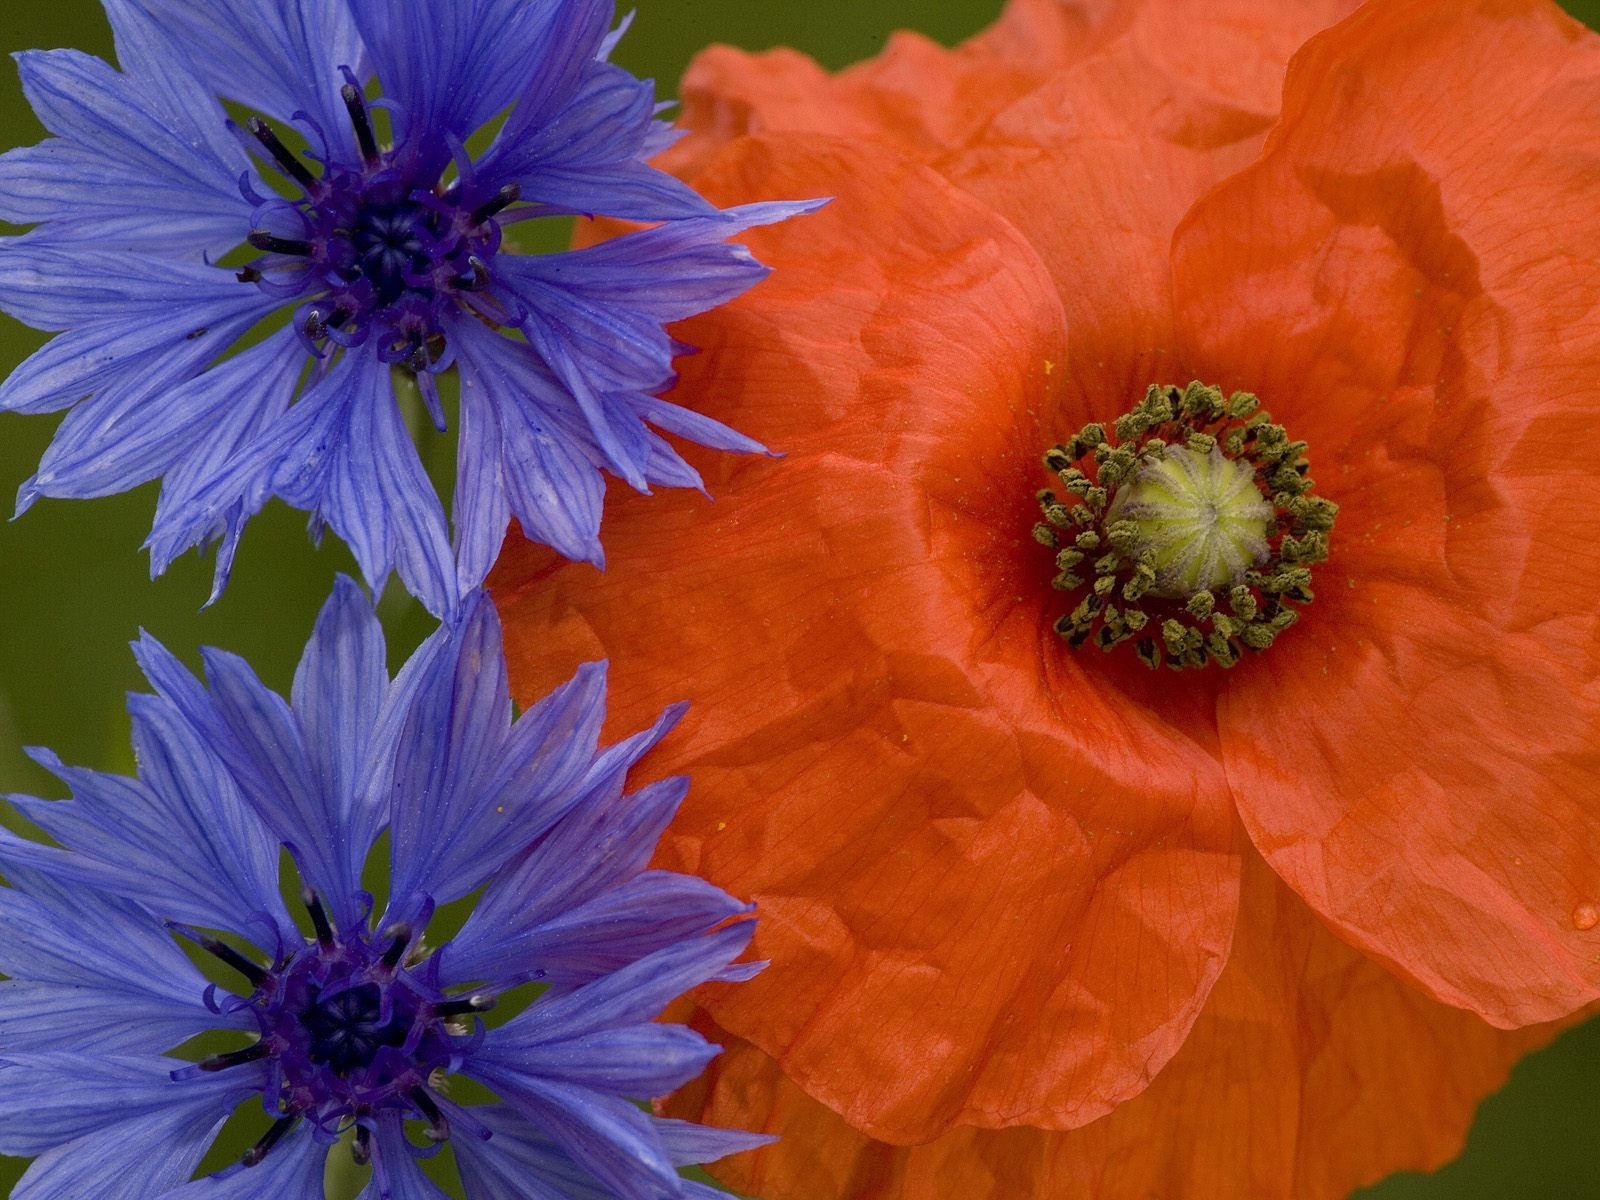 http://1.bp.blogspot.com/-MDu133WNtv0/TtEHIriWYaI/AAAAAAAAXDw/HedpZ40ICAU/s1600/Natural+Photography+%25283%2529.jpg